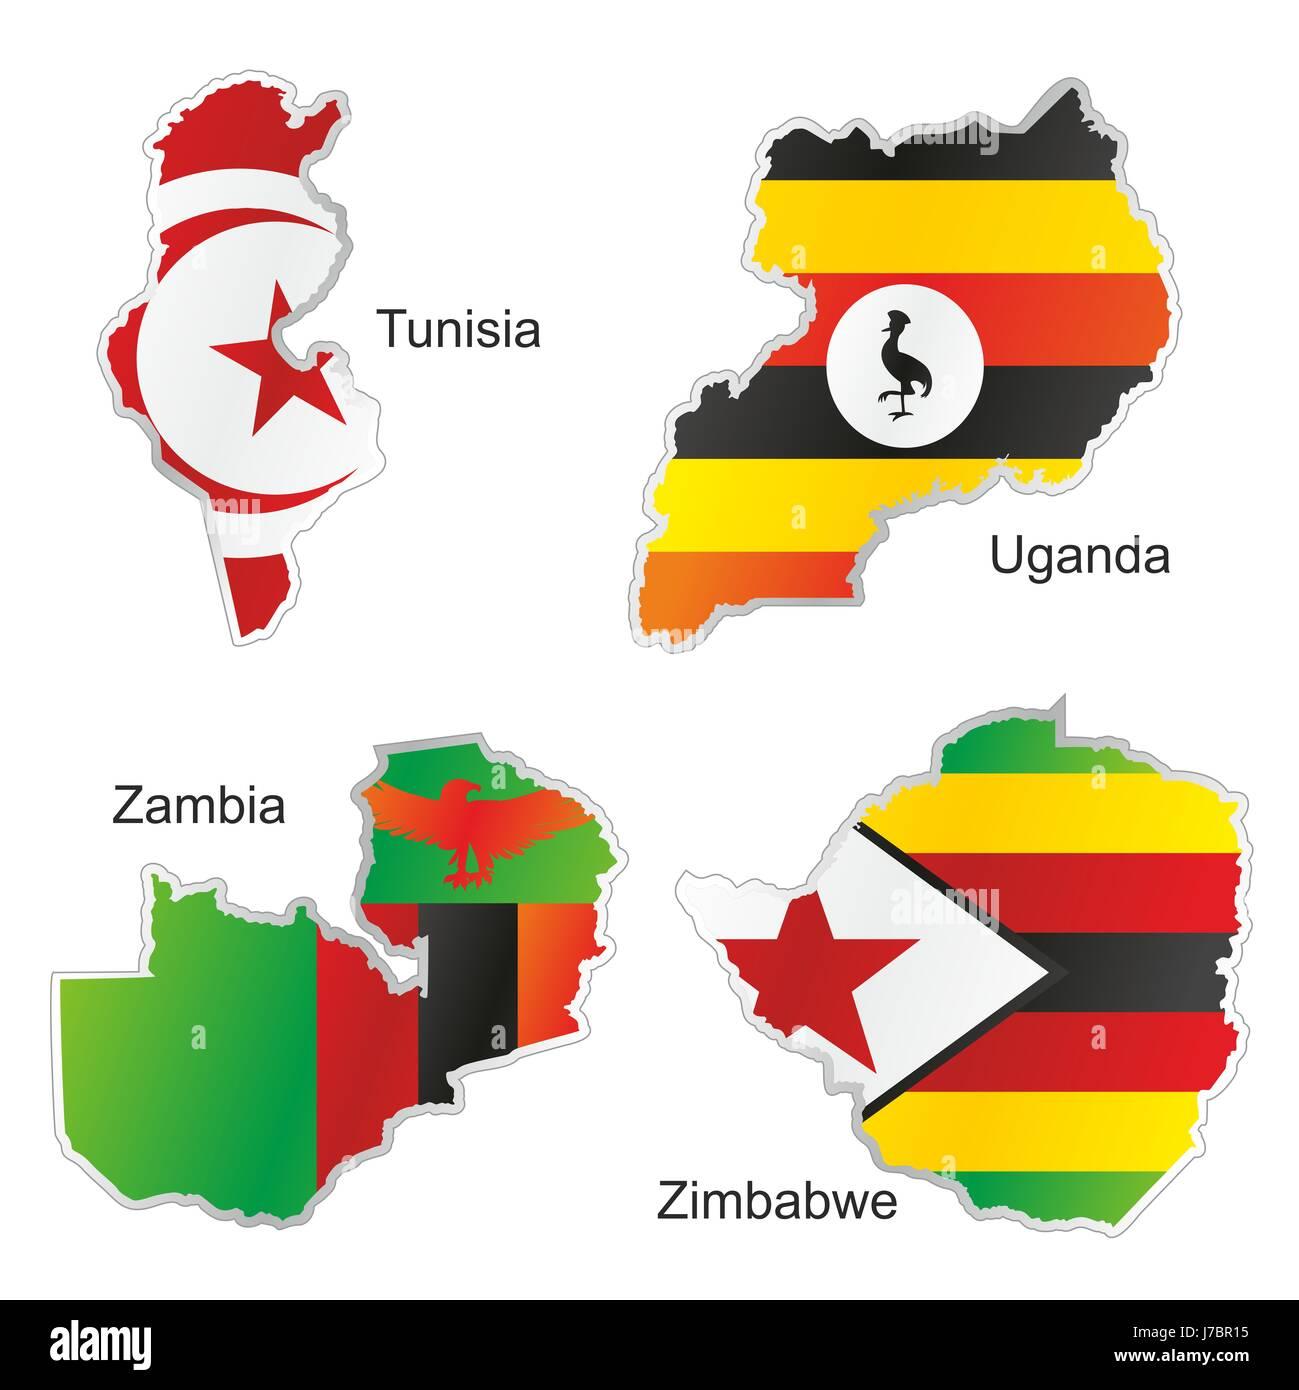 Tunesien Karte Welt.Afrika Tunesien Flagge Simbabwe Sambia Uganda Atlas Karte